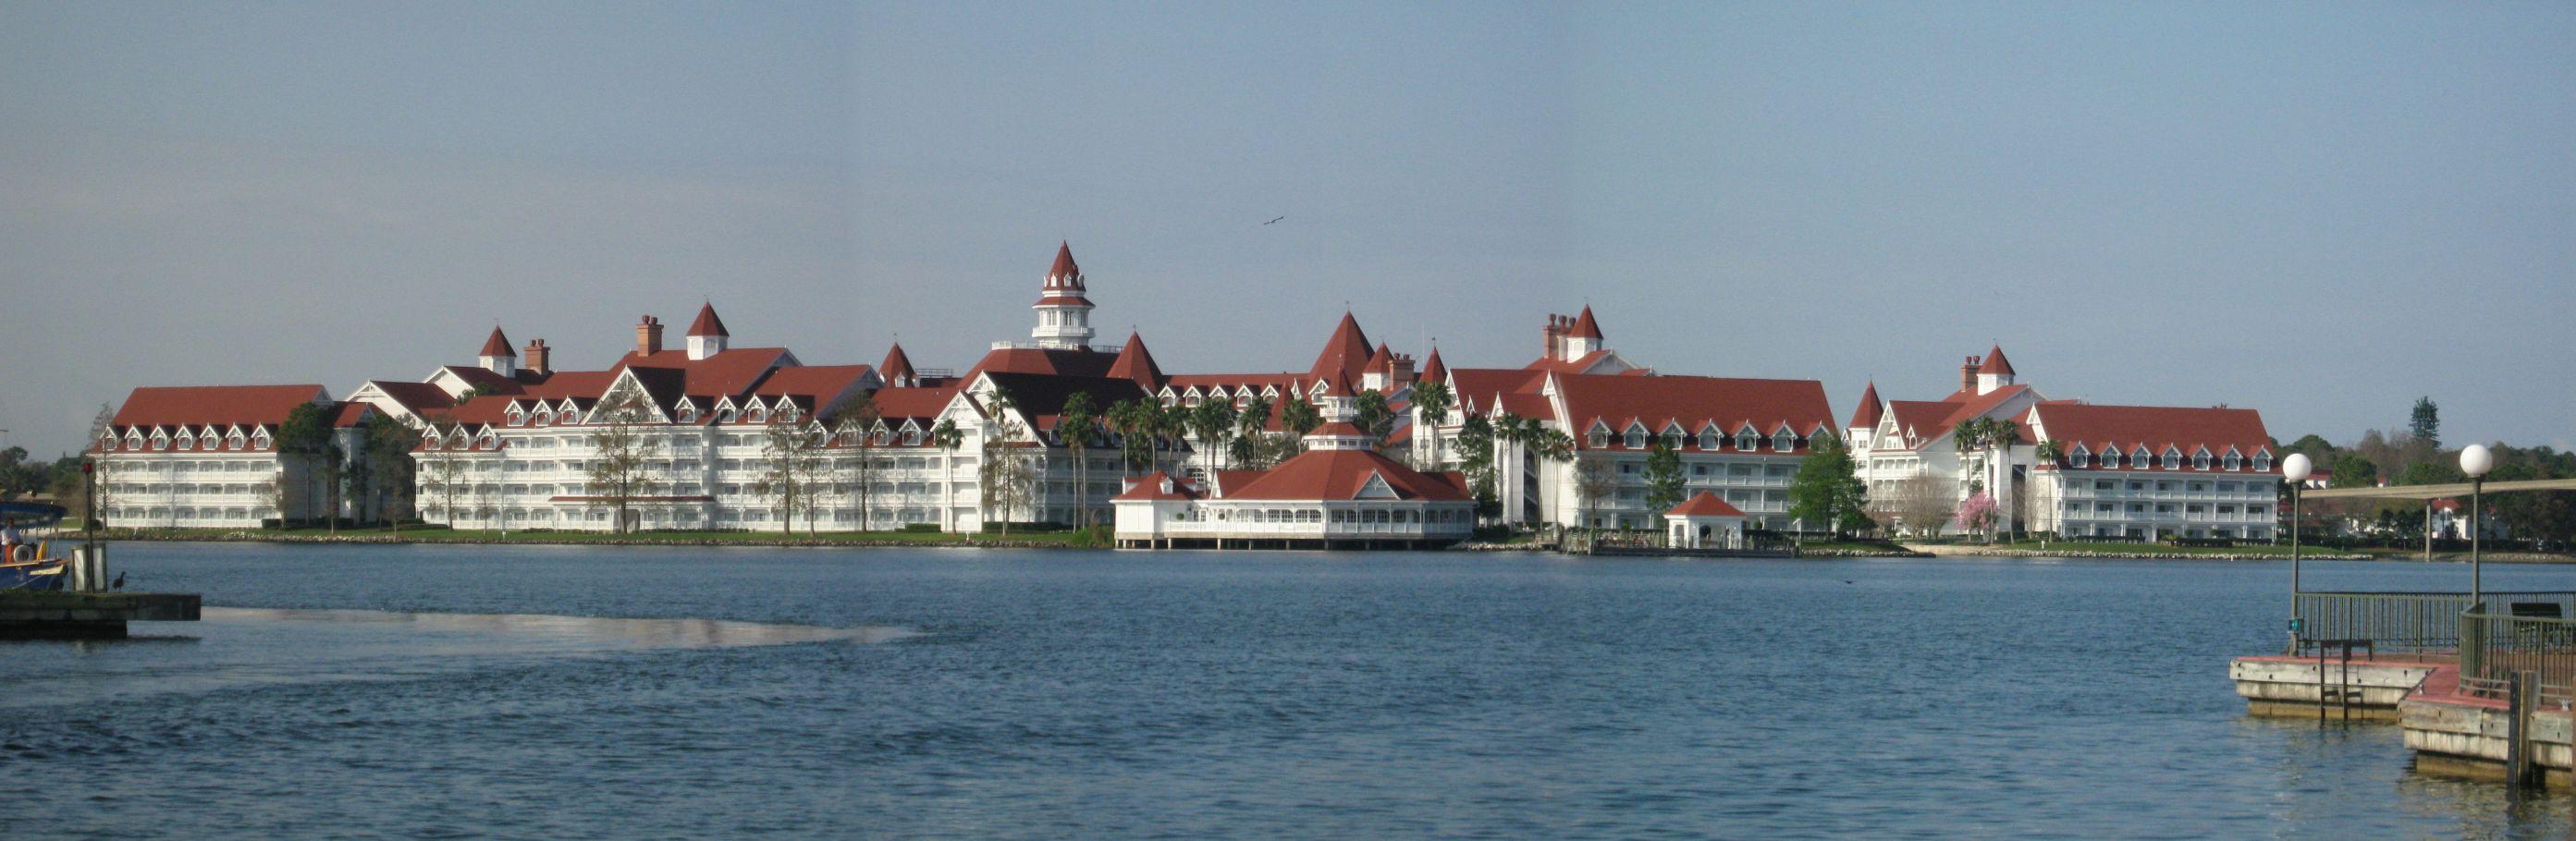 Villas In Disney World With  Bedrooms